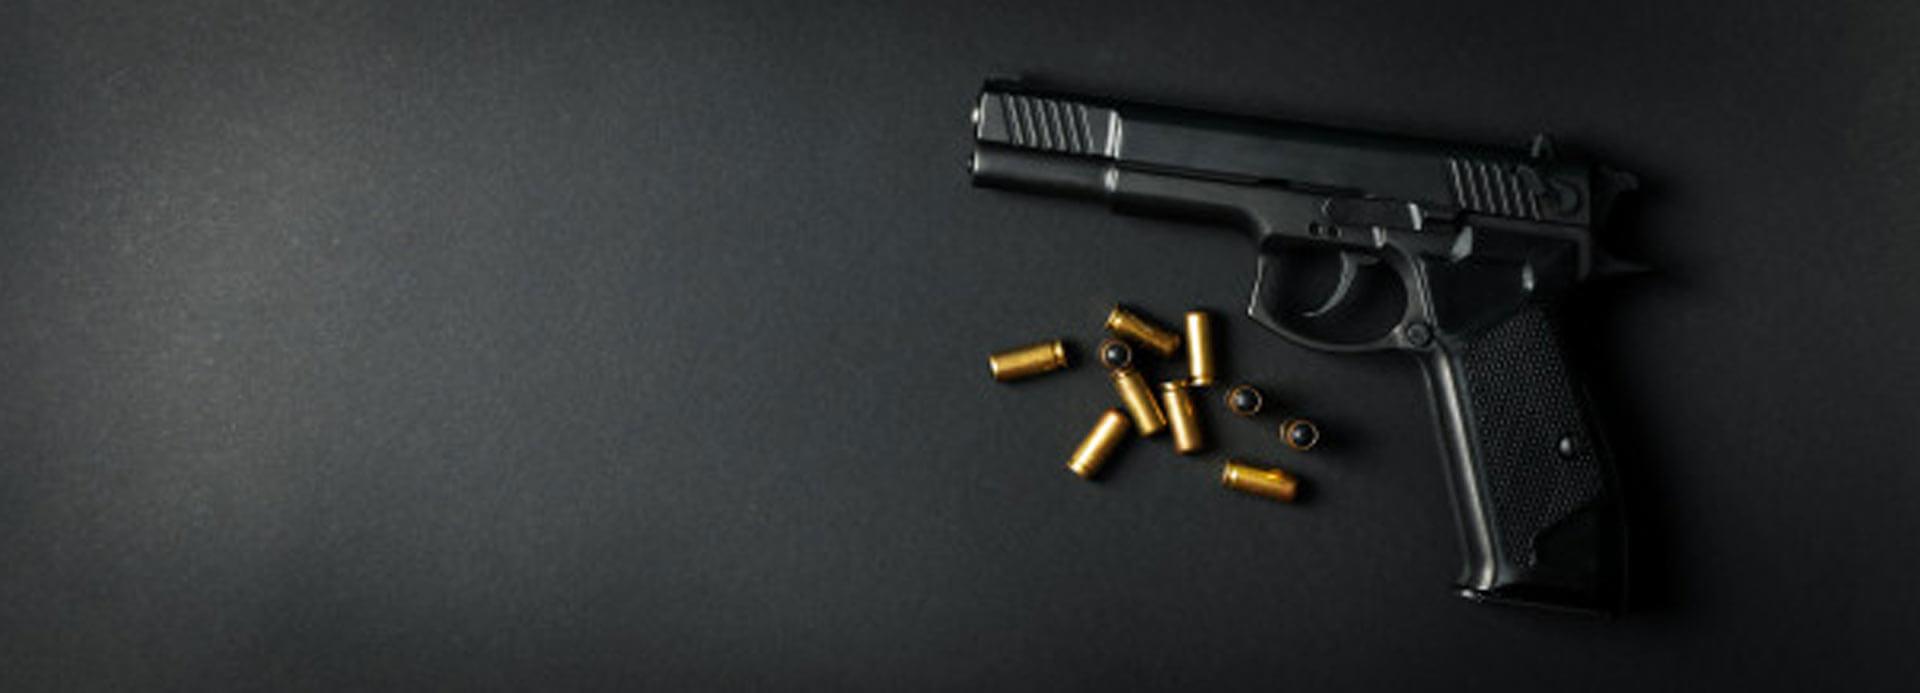 gun crimes The Law office of John Vermon Moore